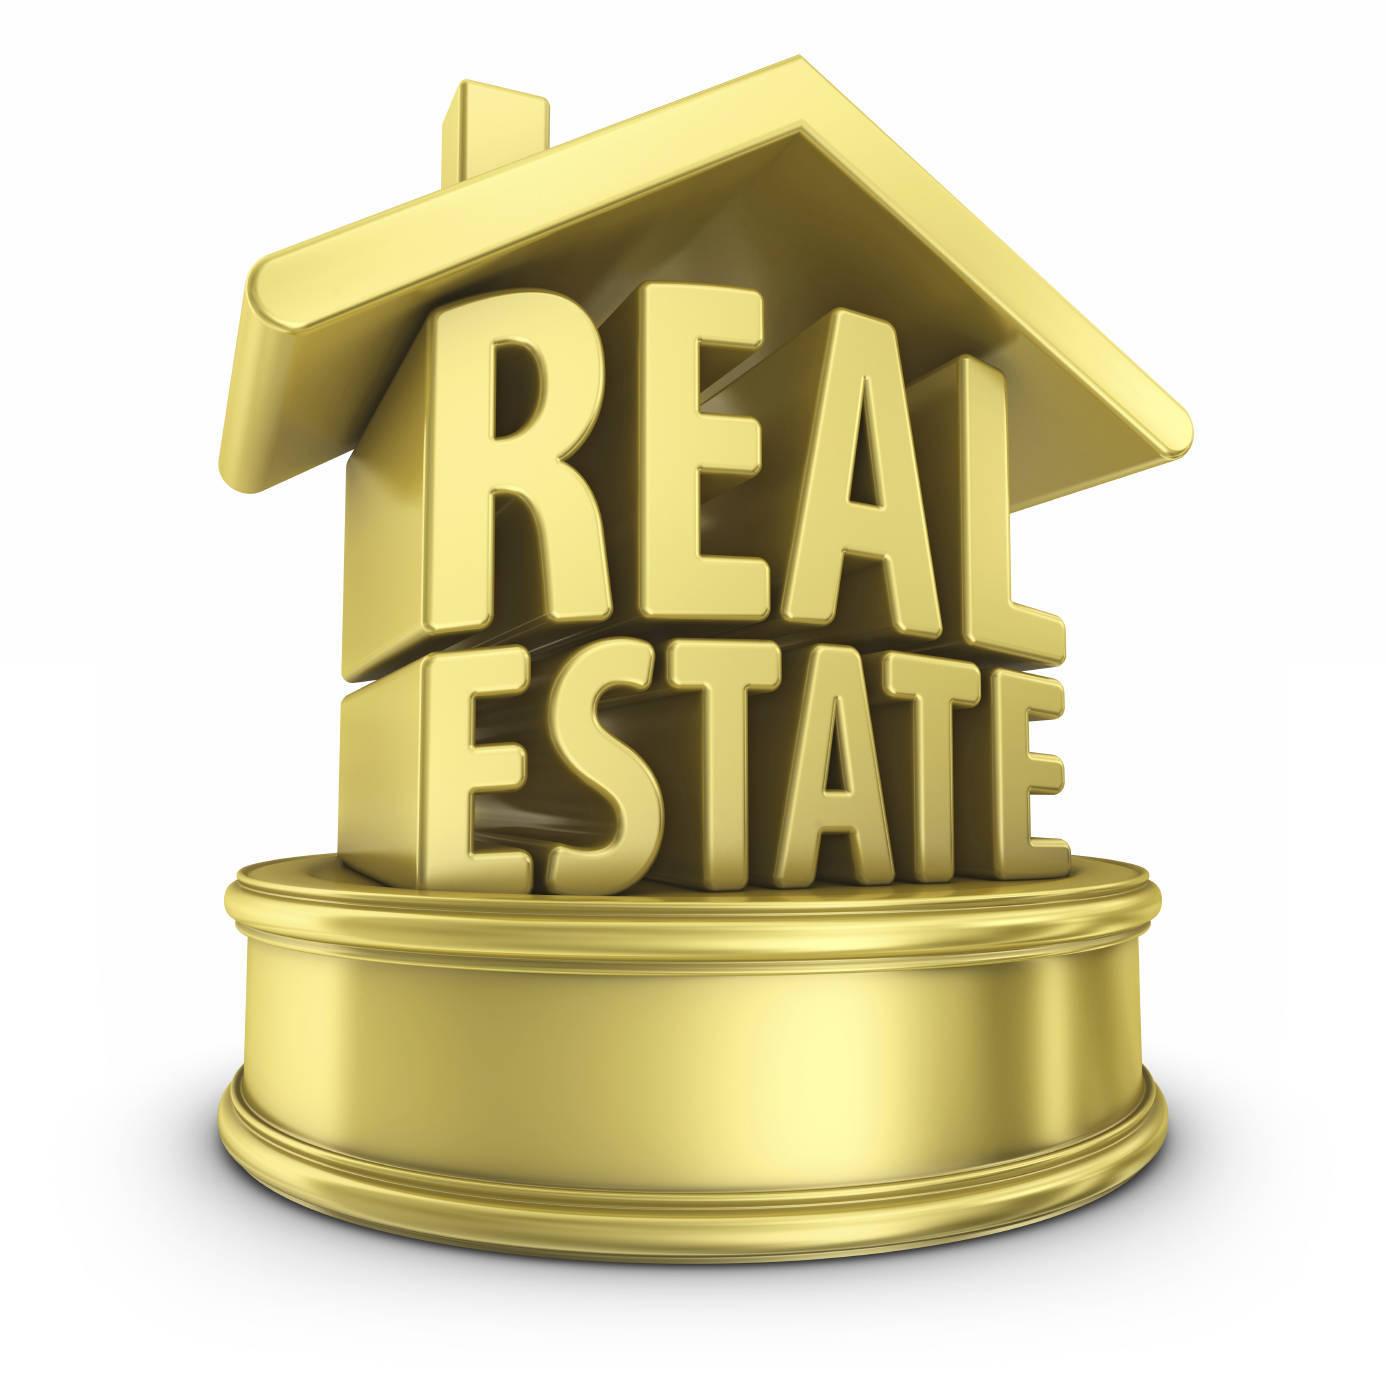 f7bc8c19e8f880c0fb1f_word-real-estate.jpg